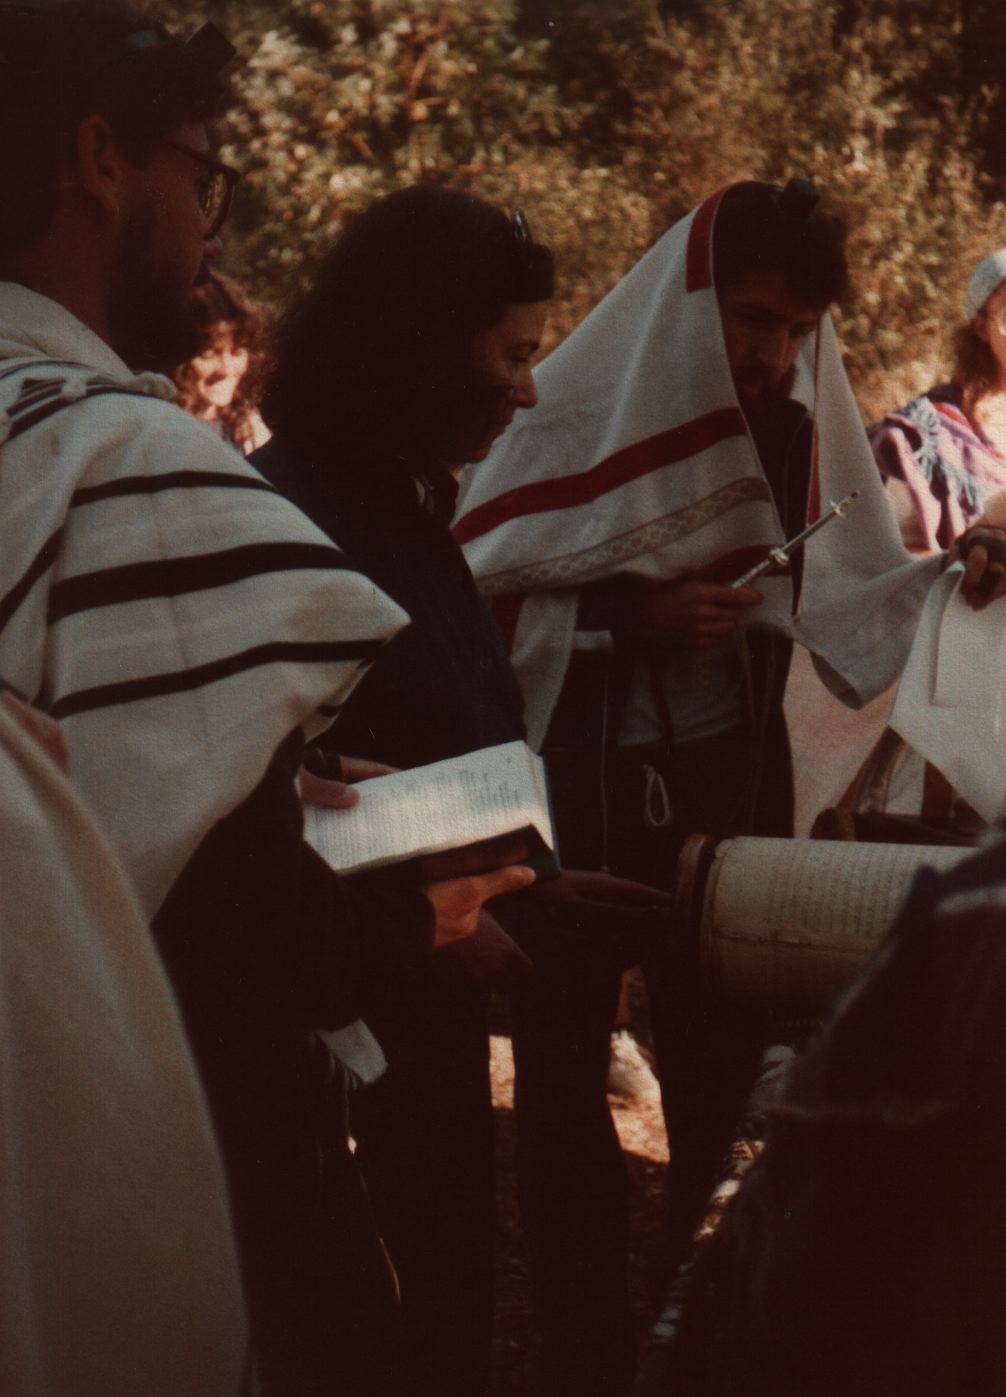 84 Joys  Torah service, with Avram Davis, Debra De Vries in back, Telma Dinstein (?), Hillel Zeitlin, Karen(1:2 face) copy.jpg